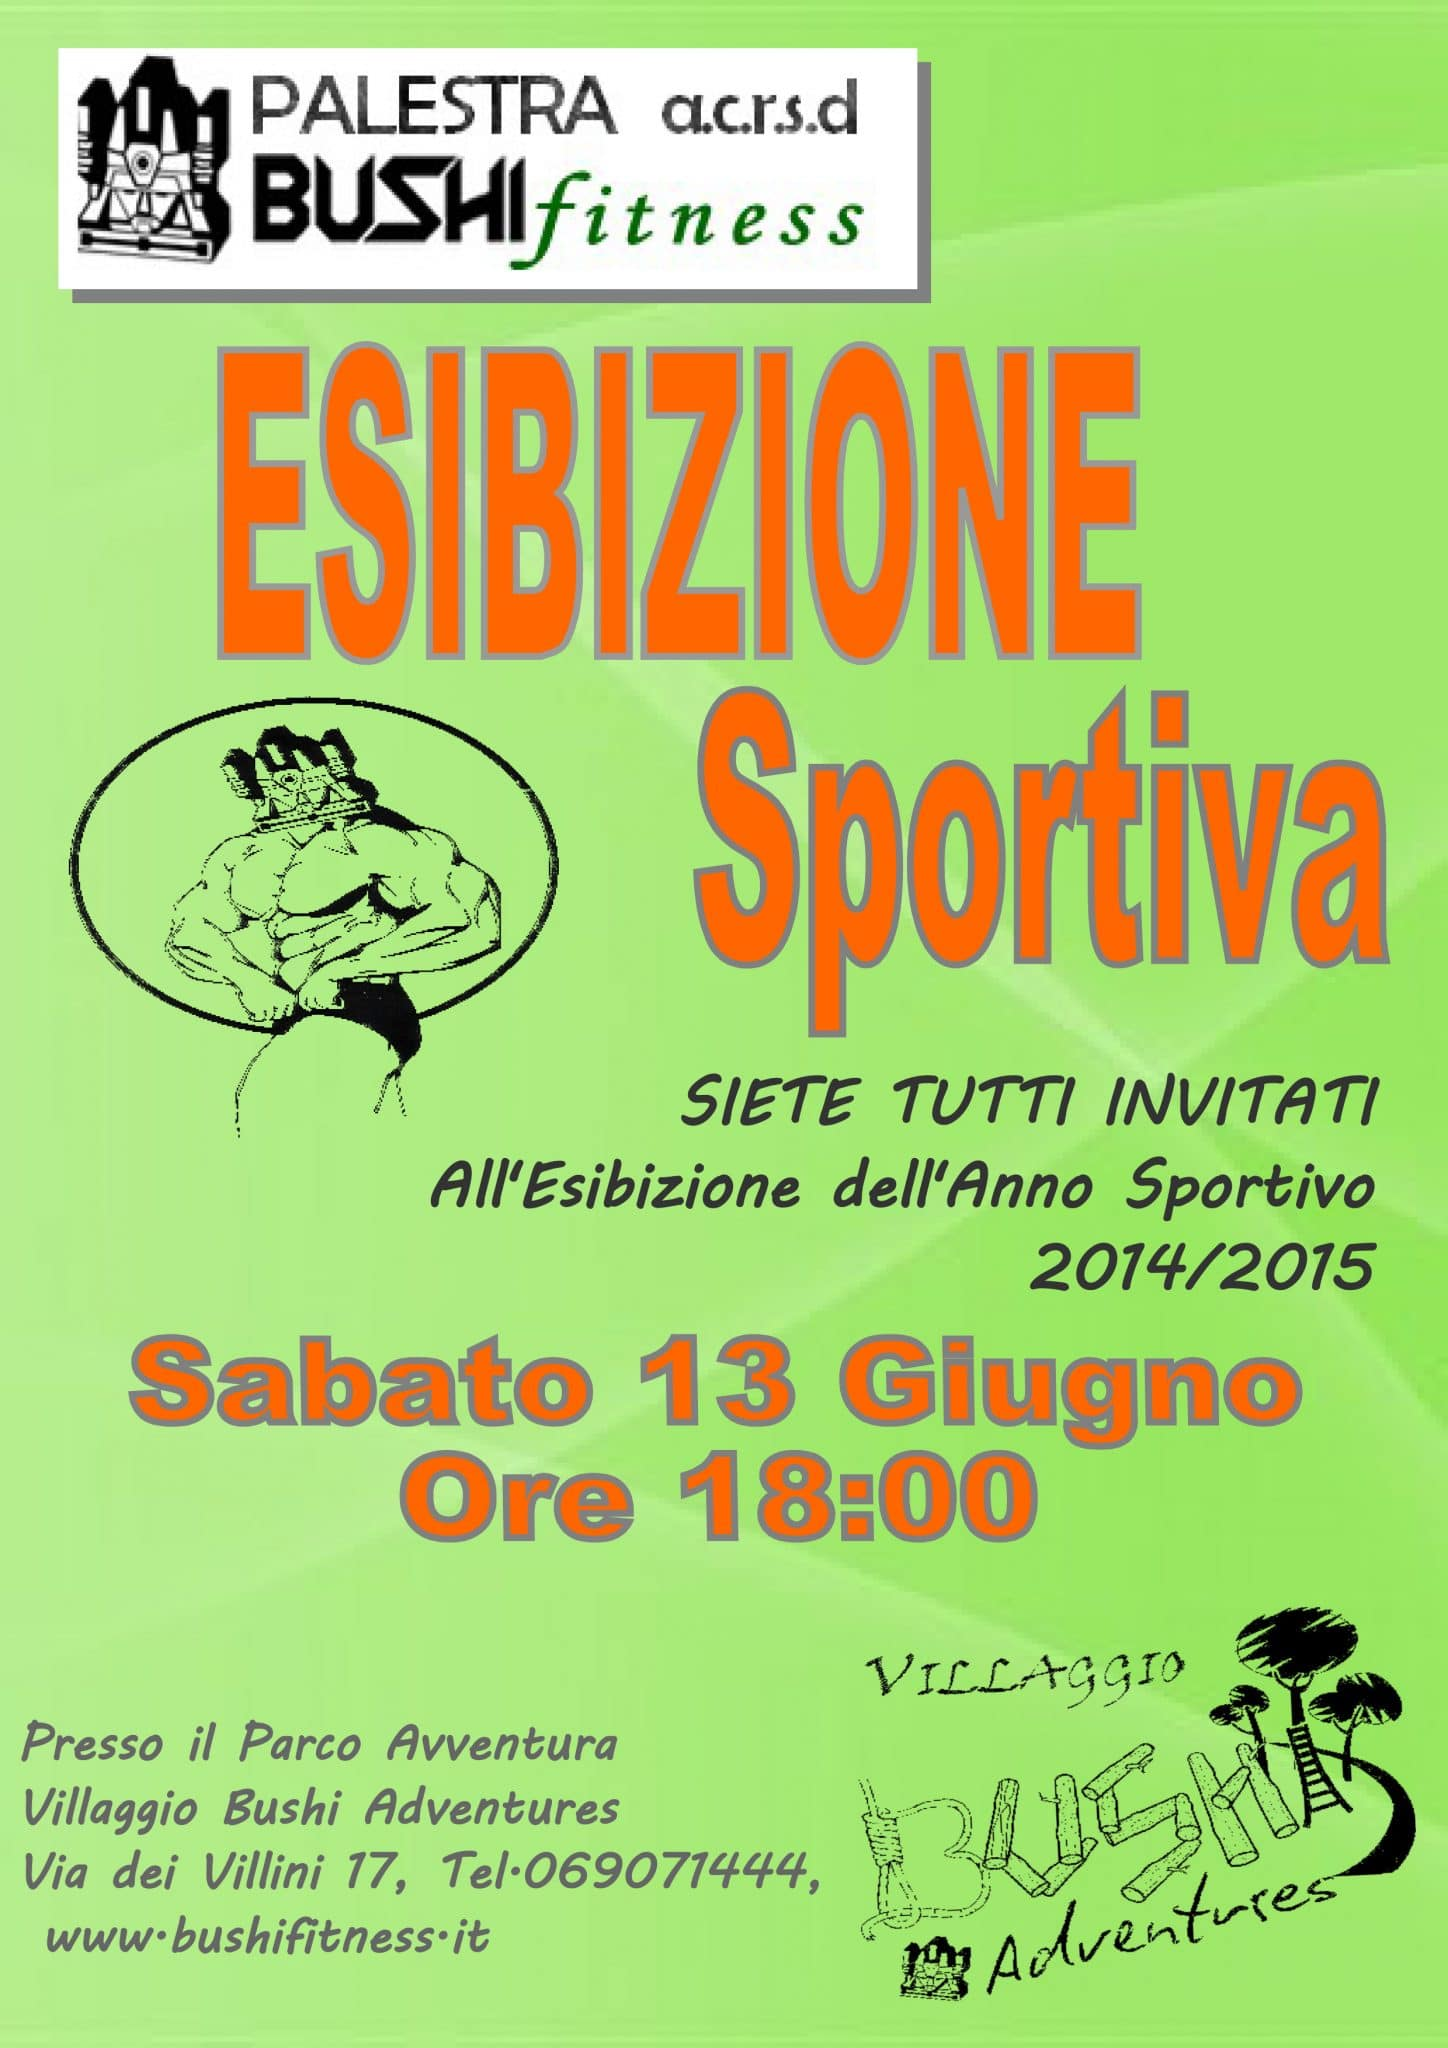 ESIBIZIONE-SPORTIVA-2014-2015 (1) Esibizione Sportiva Esibizione Sportiva ESIBIZIONE SPORTIVA 2014 2015 1